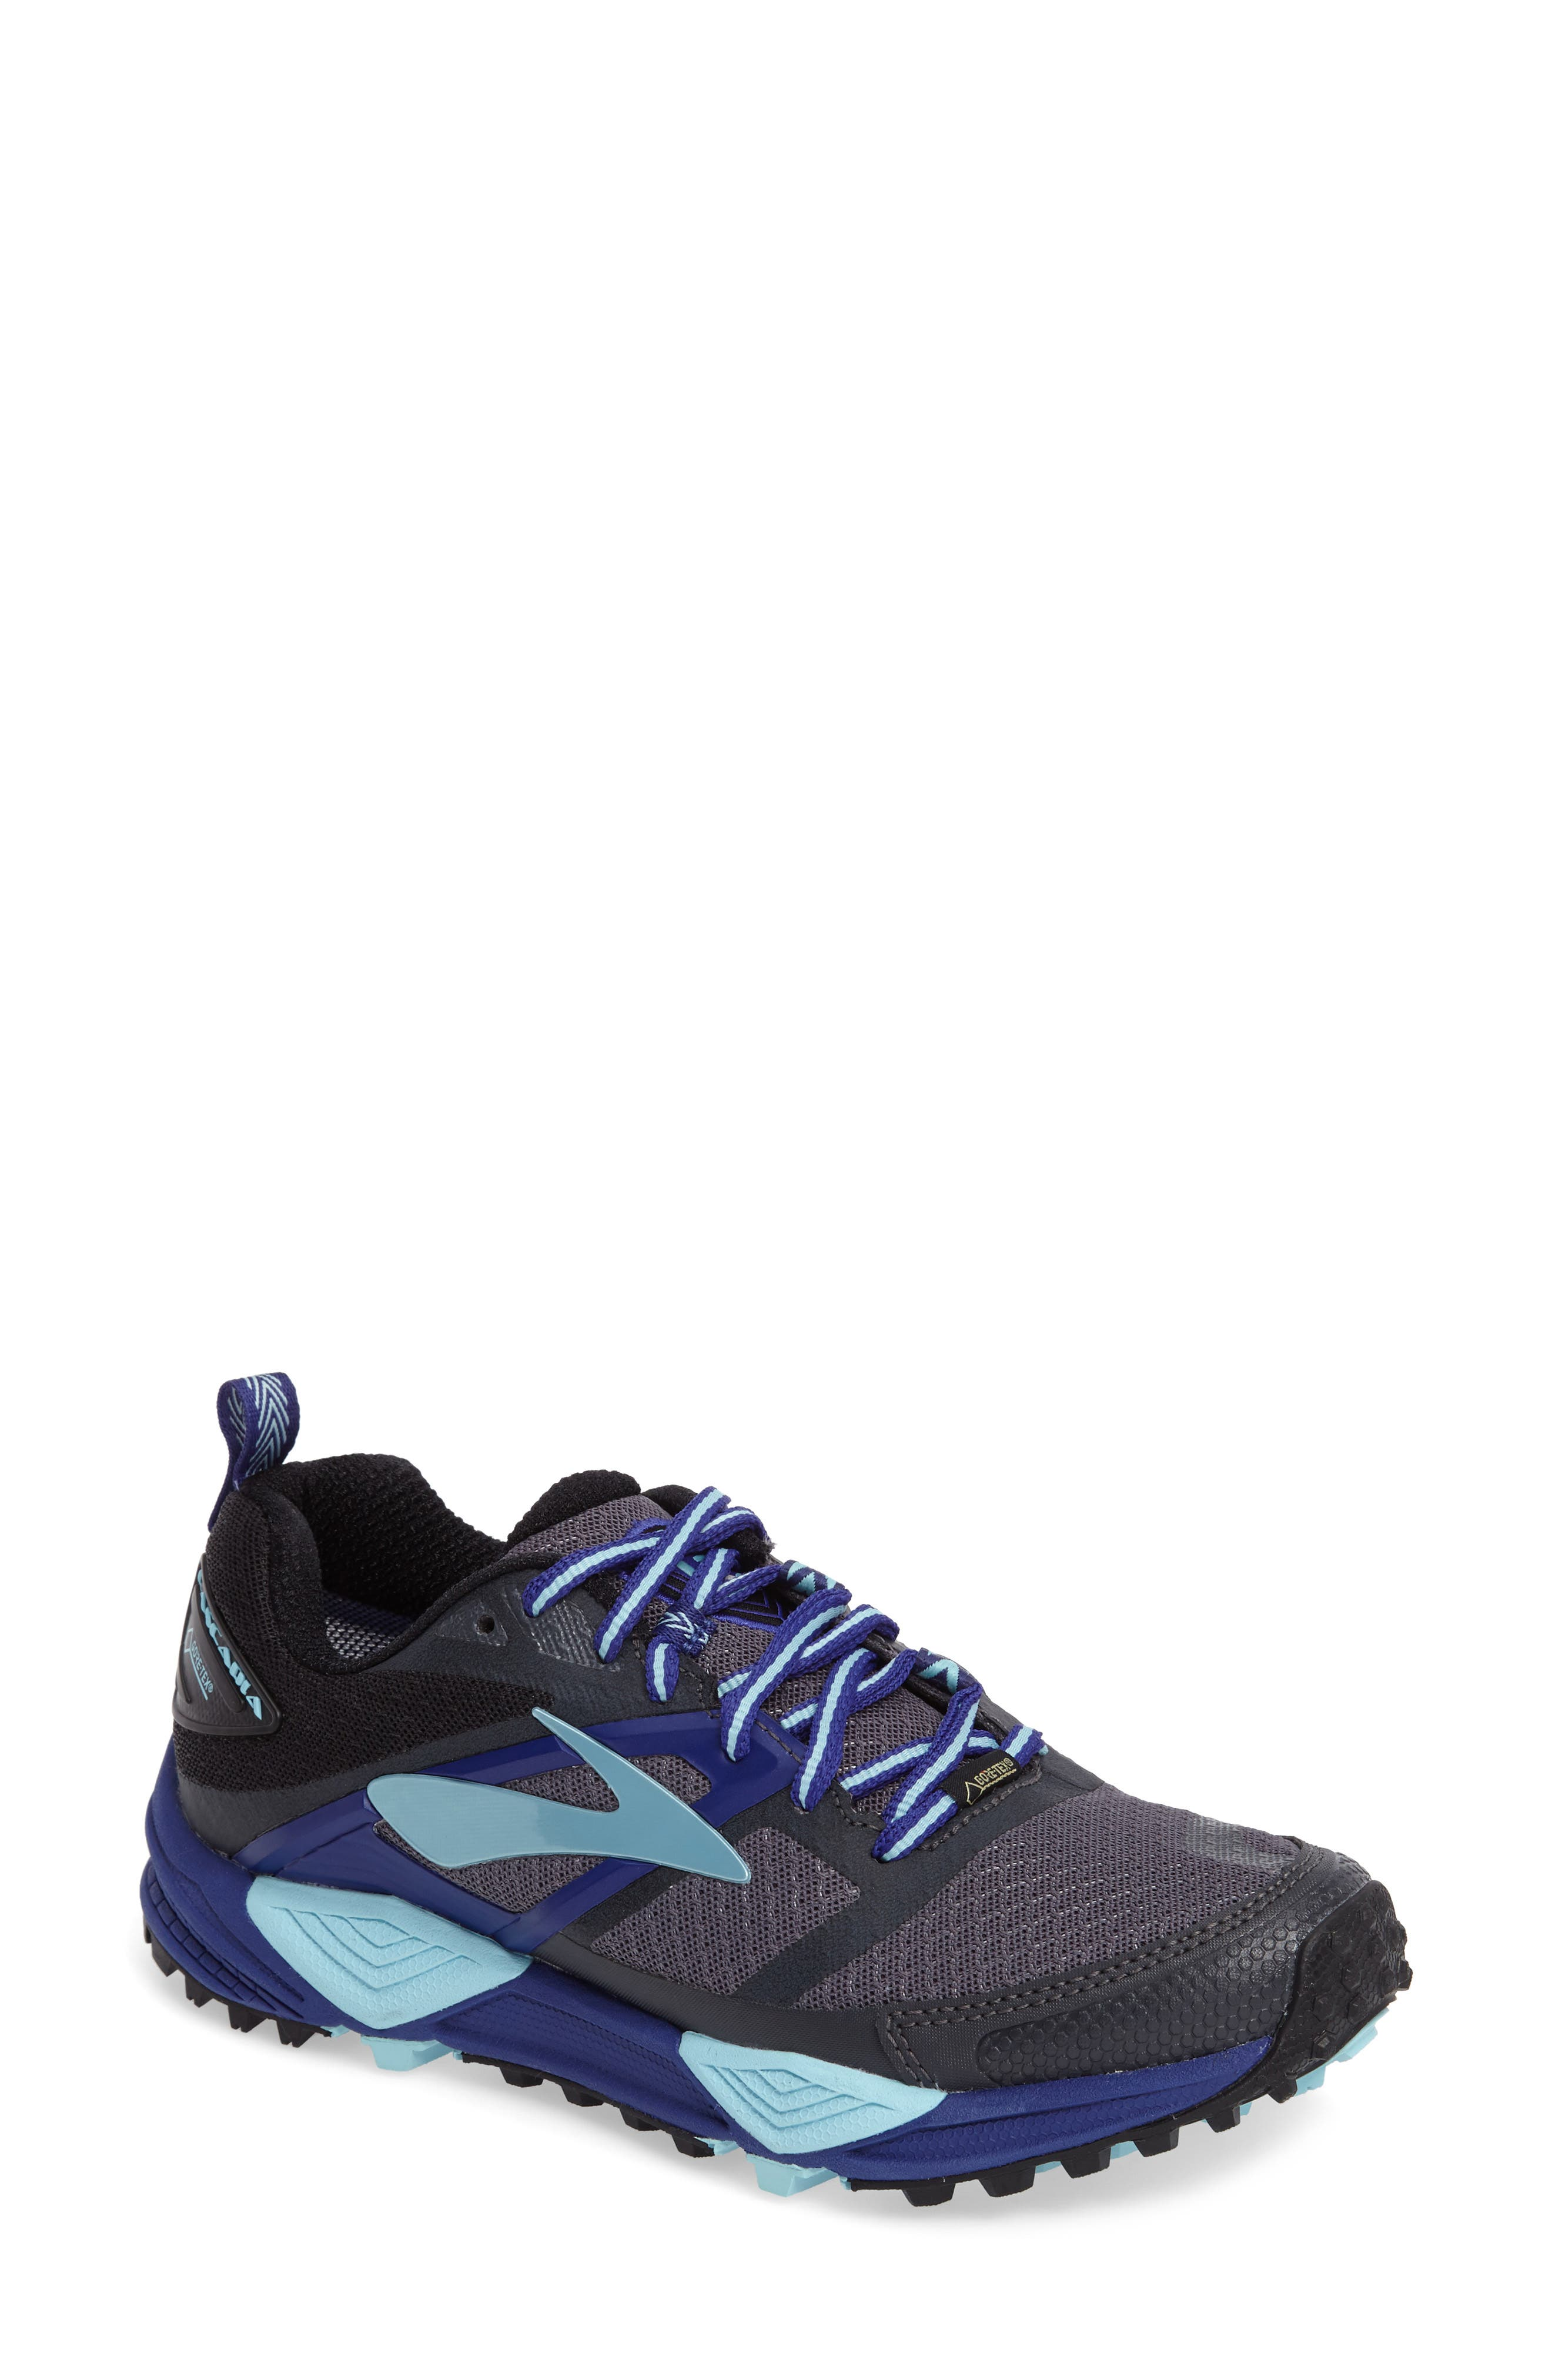 Main Image - Brooks Cascadia 12 GTX Trail Running Shoe (Women)